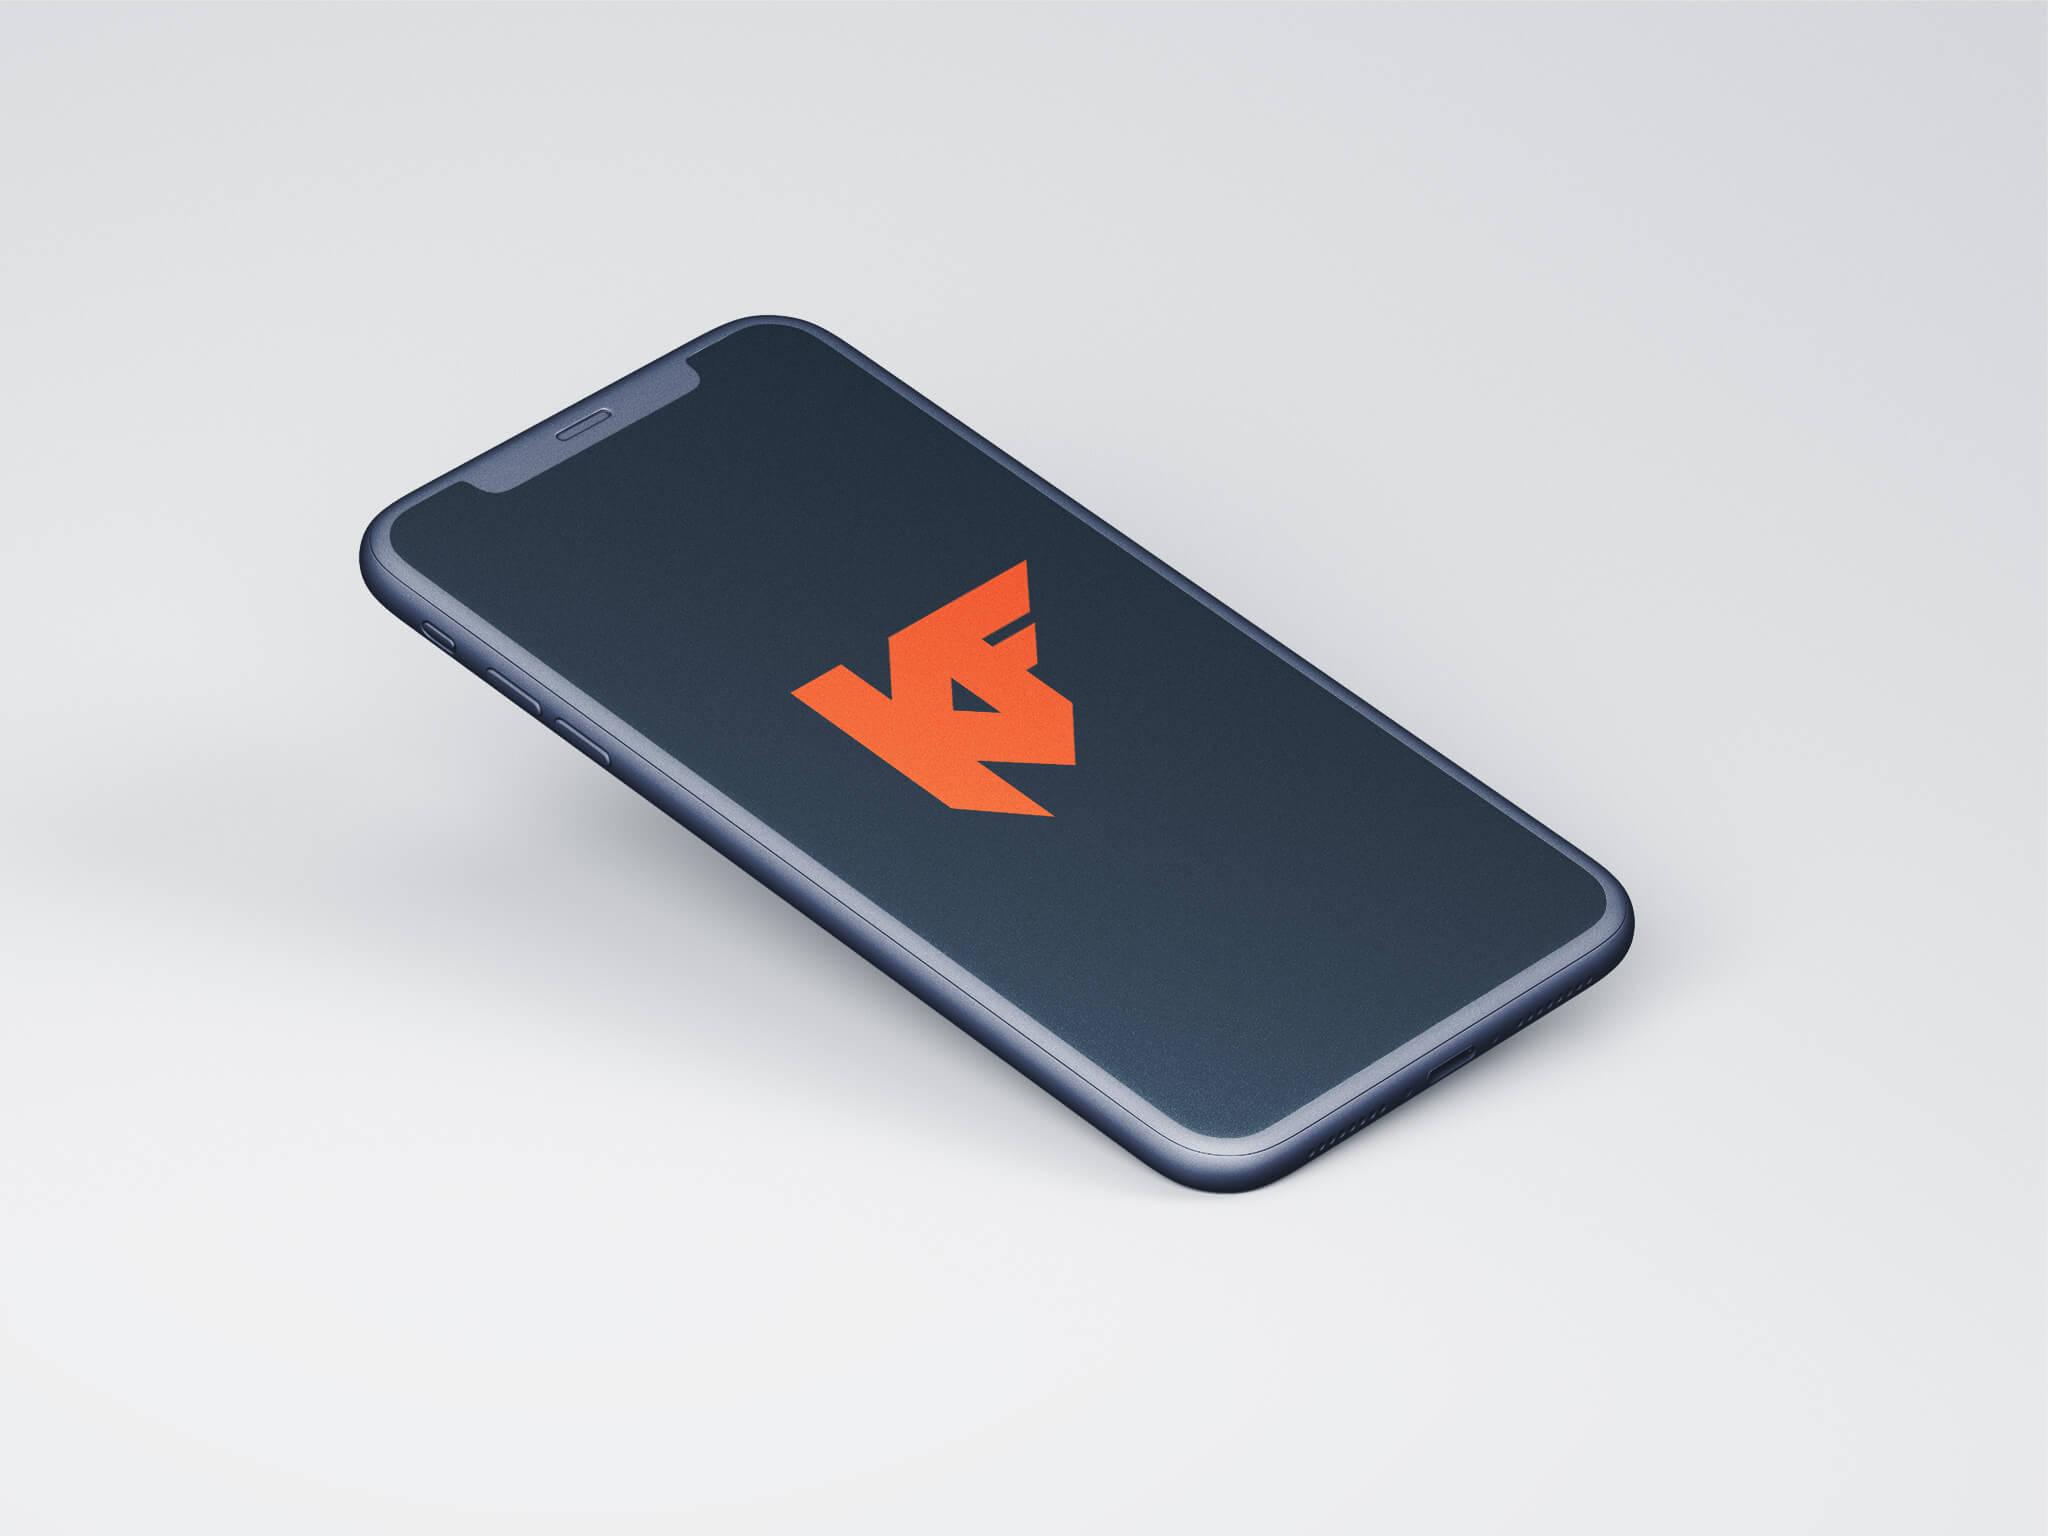 logon suunnittelu-konsolifin-logo iphonessa